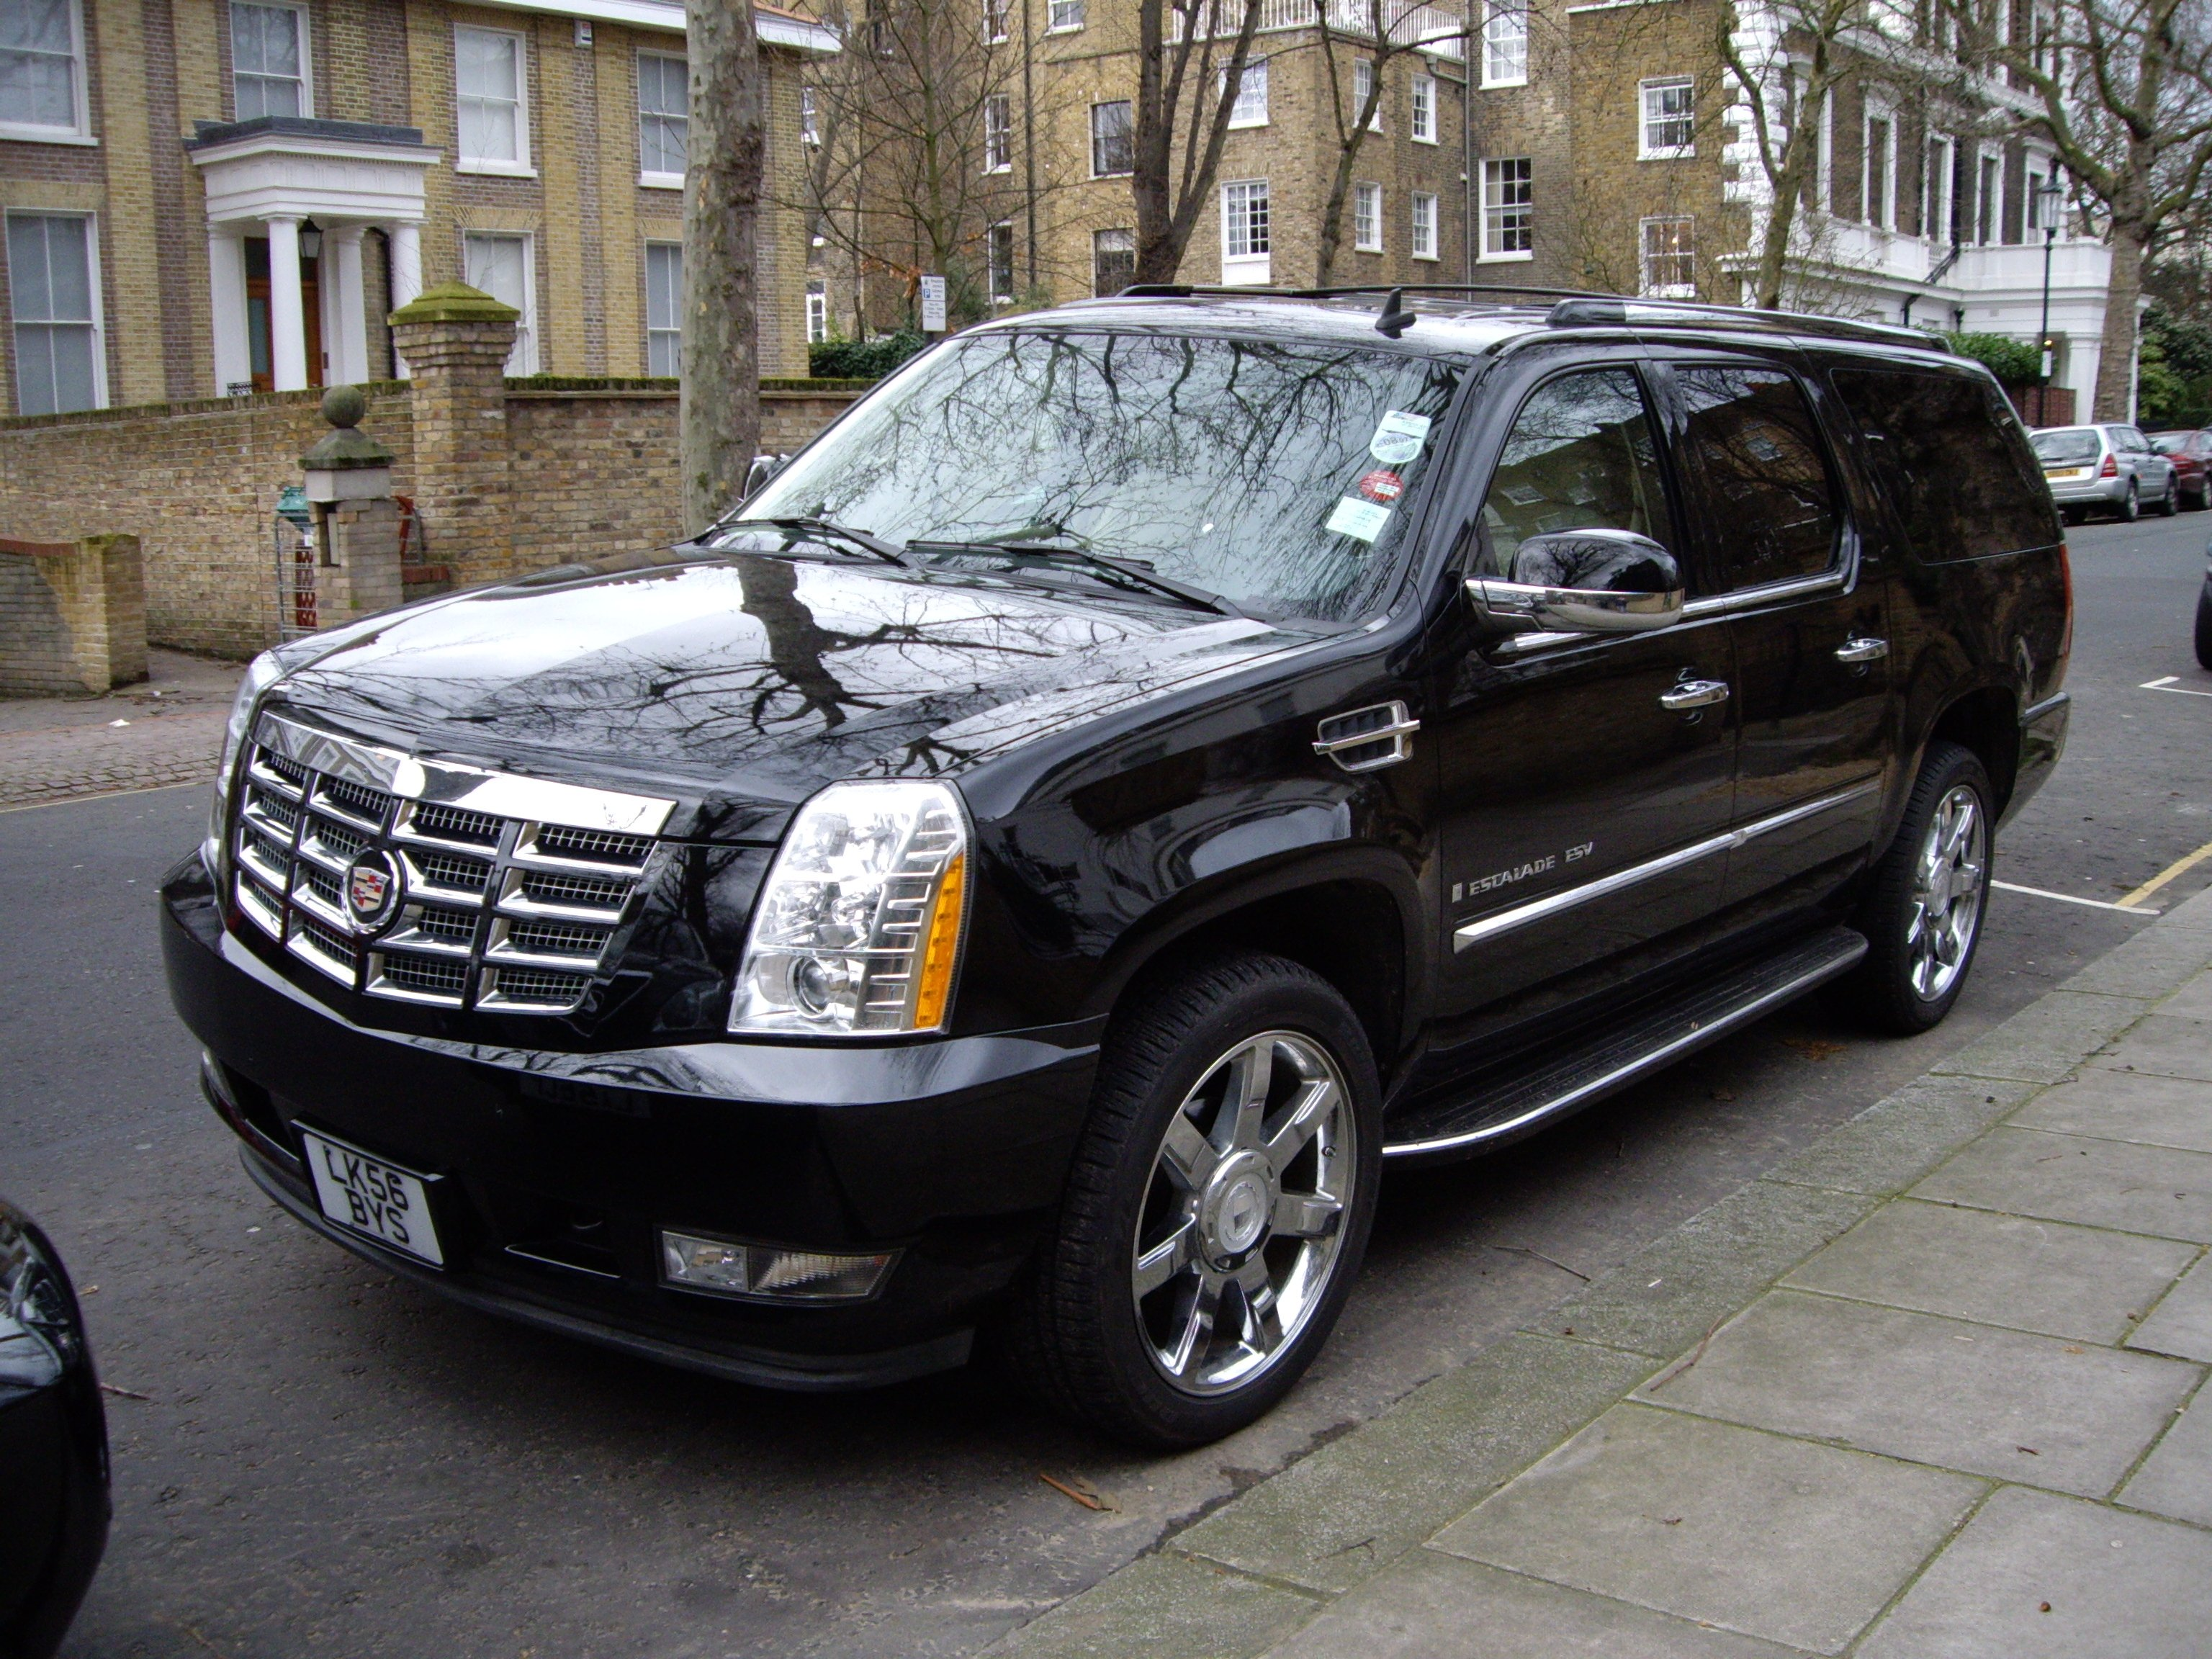 2012 Cadillac Escalade Platinum For Sale >> File:Cadillac Escalade (2).jpg